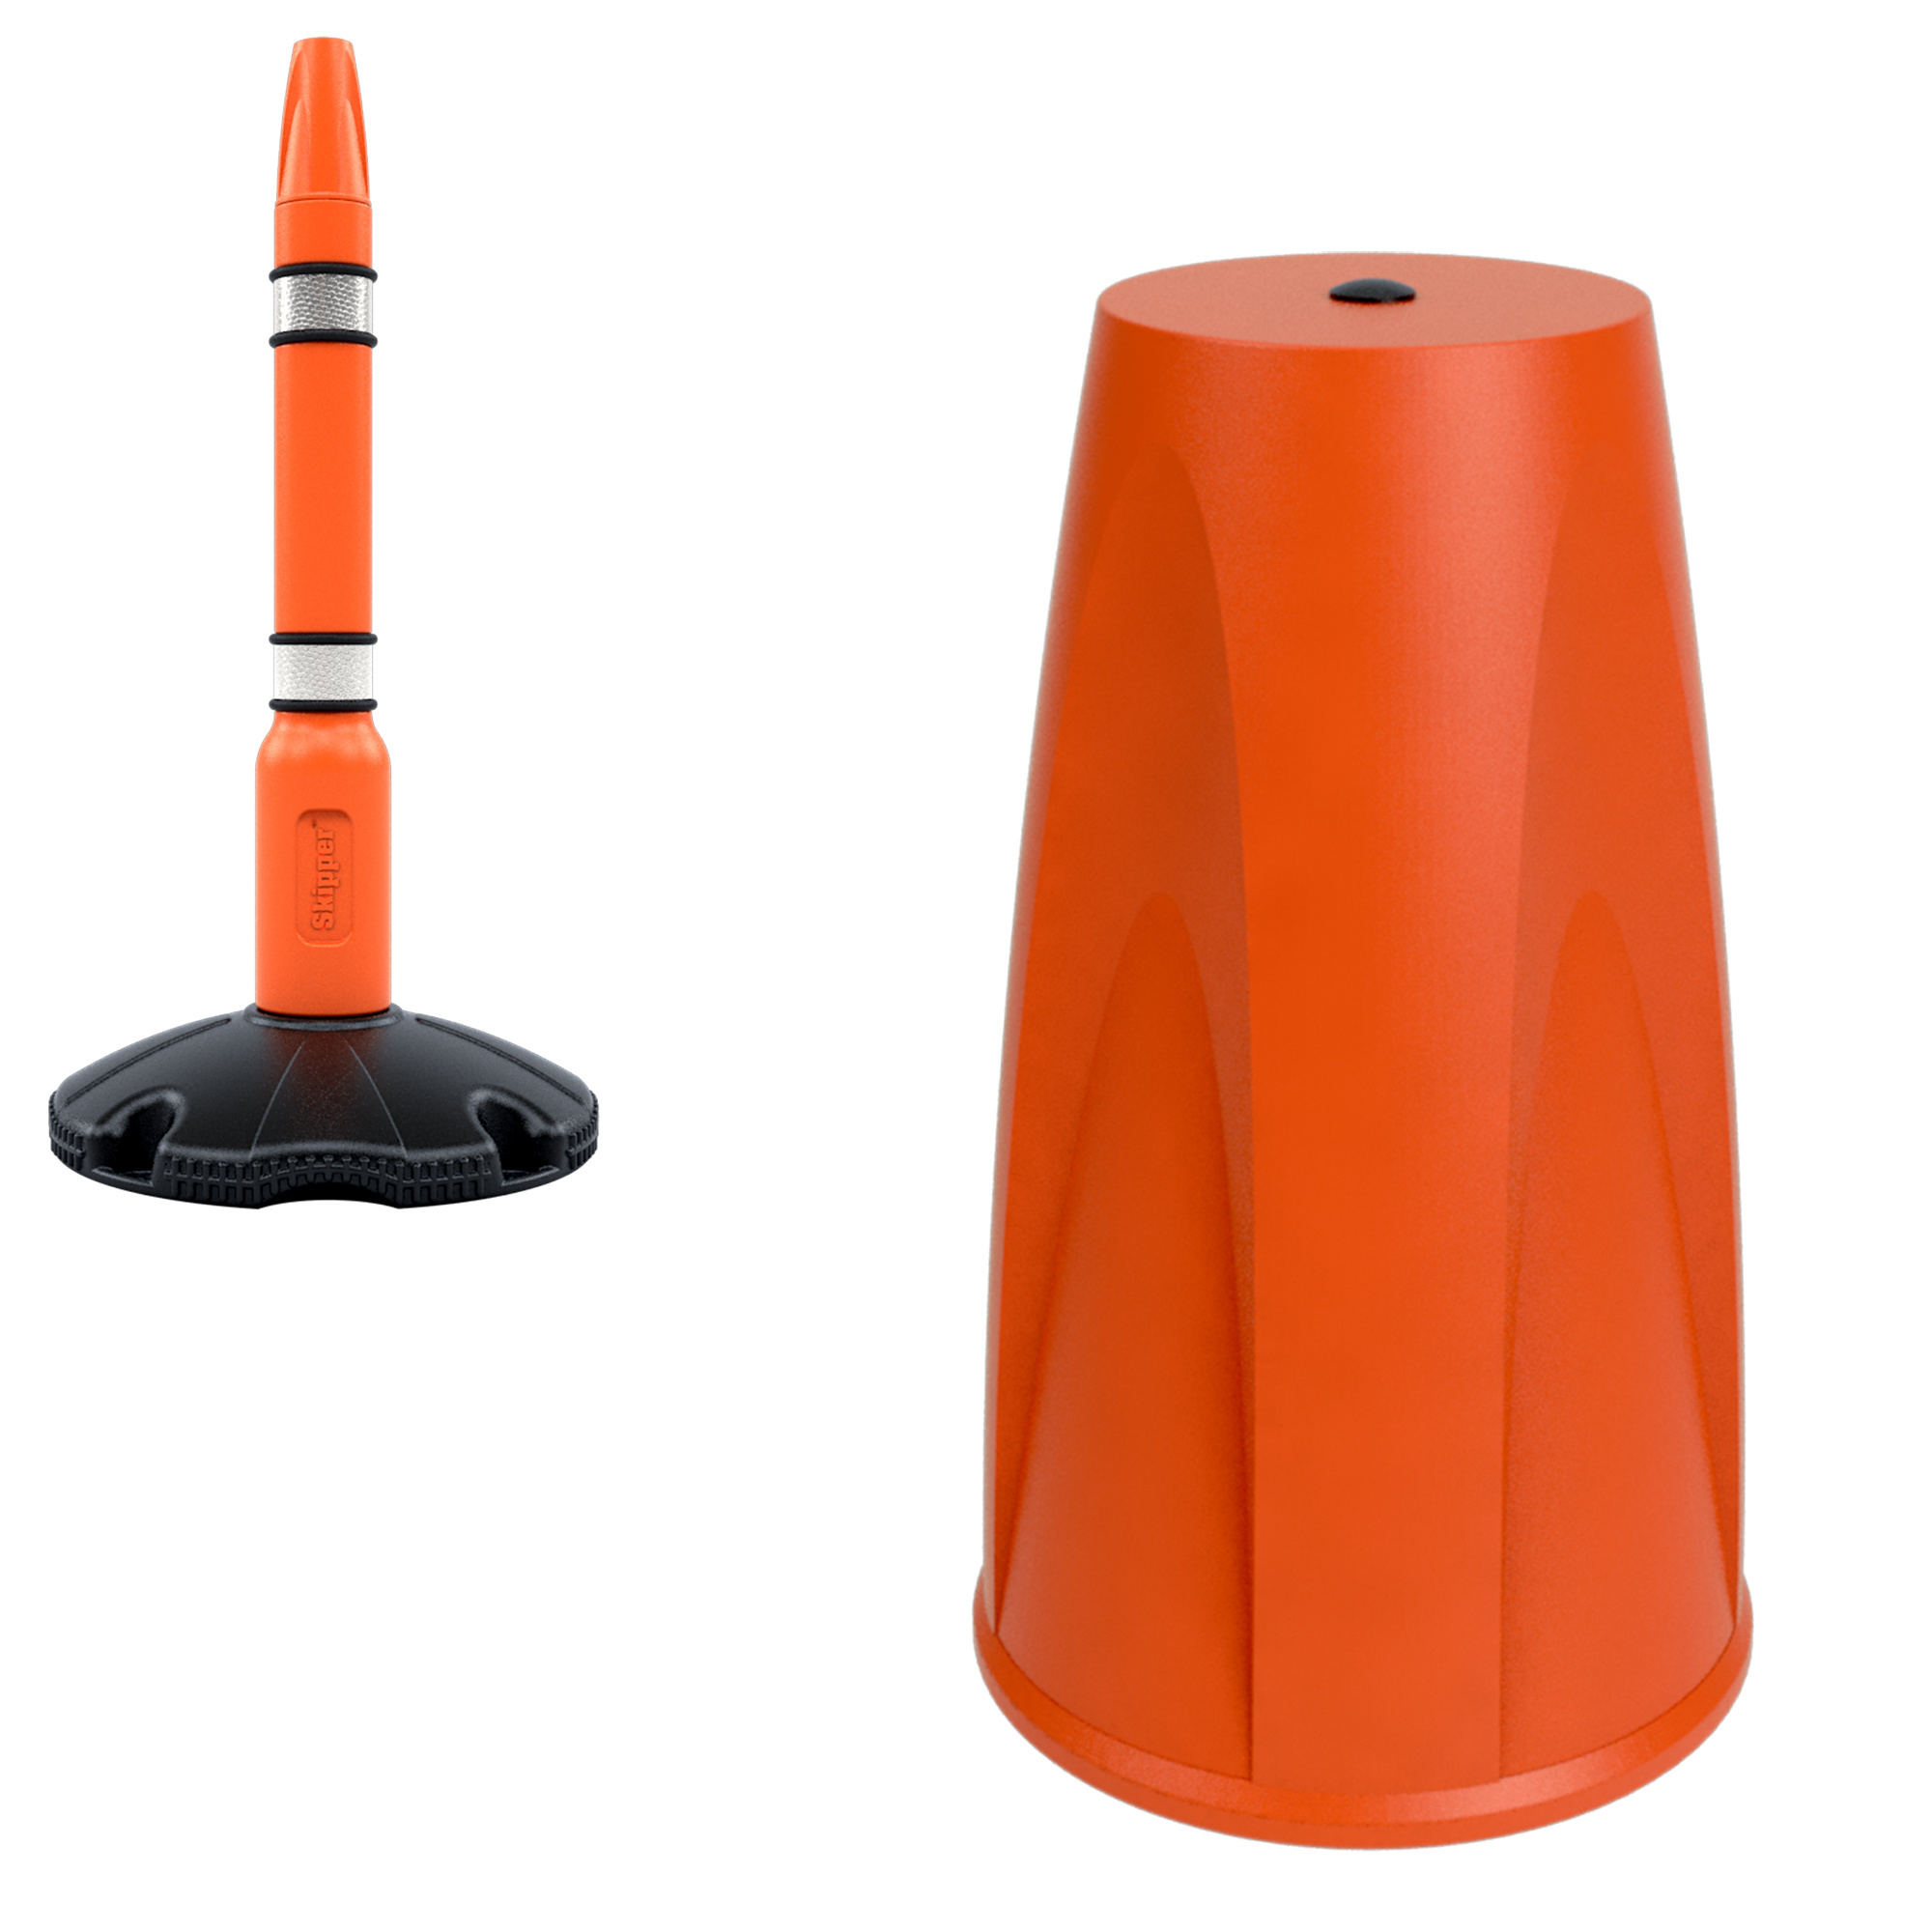 SKIPPER Eindkap voor SKIPPER afzetpaal - oranje